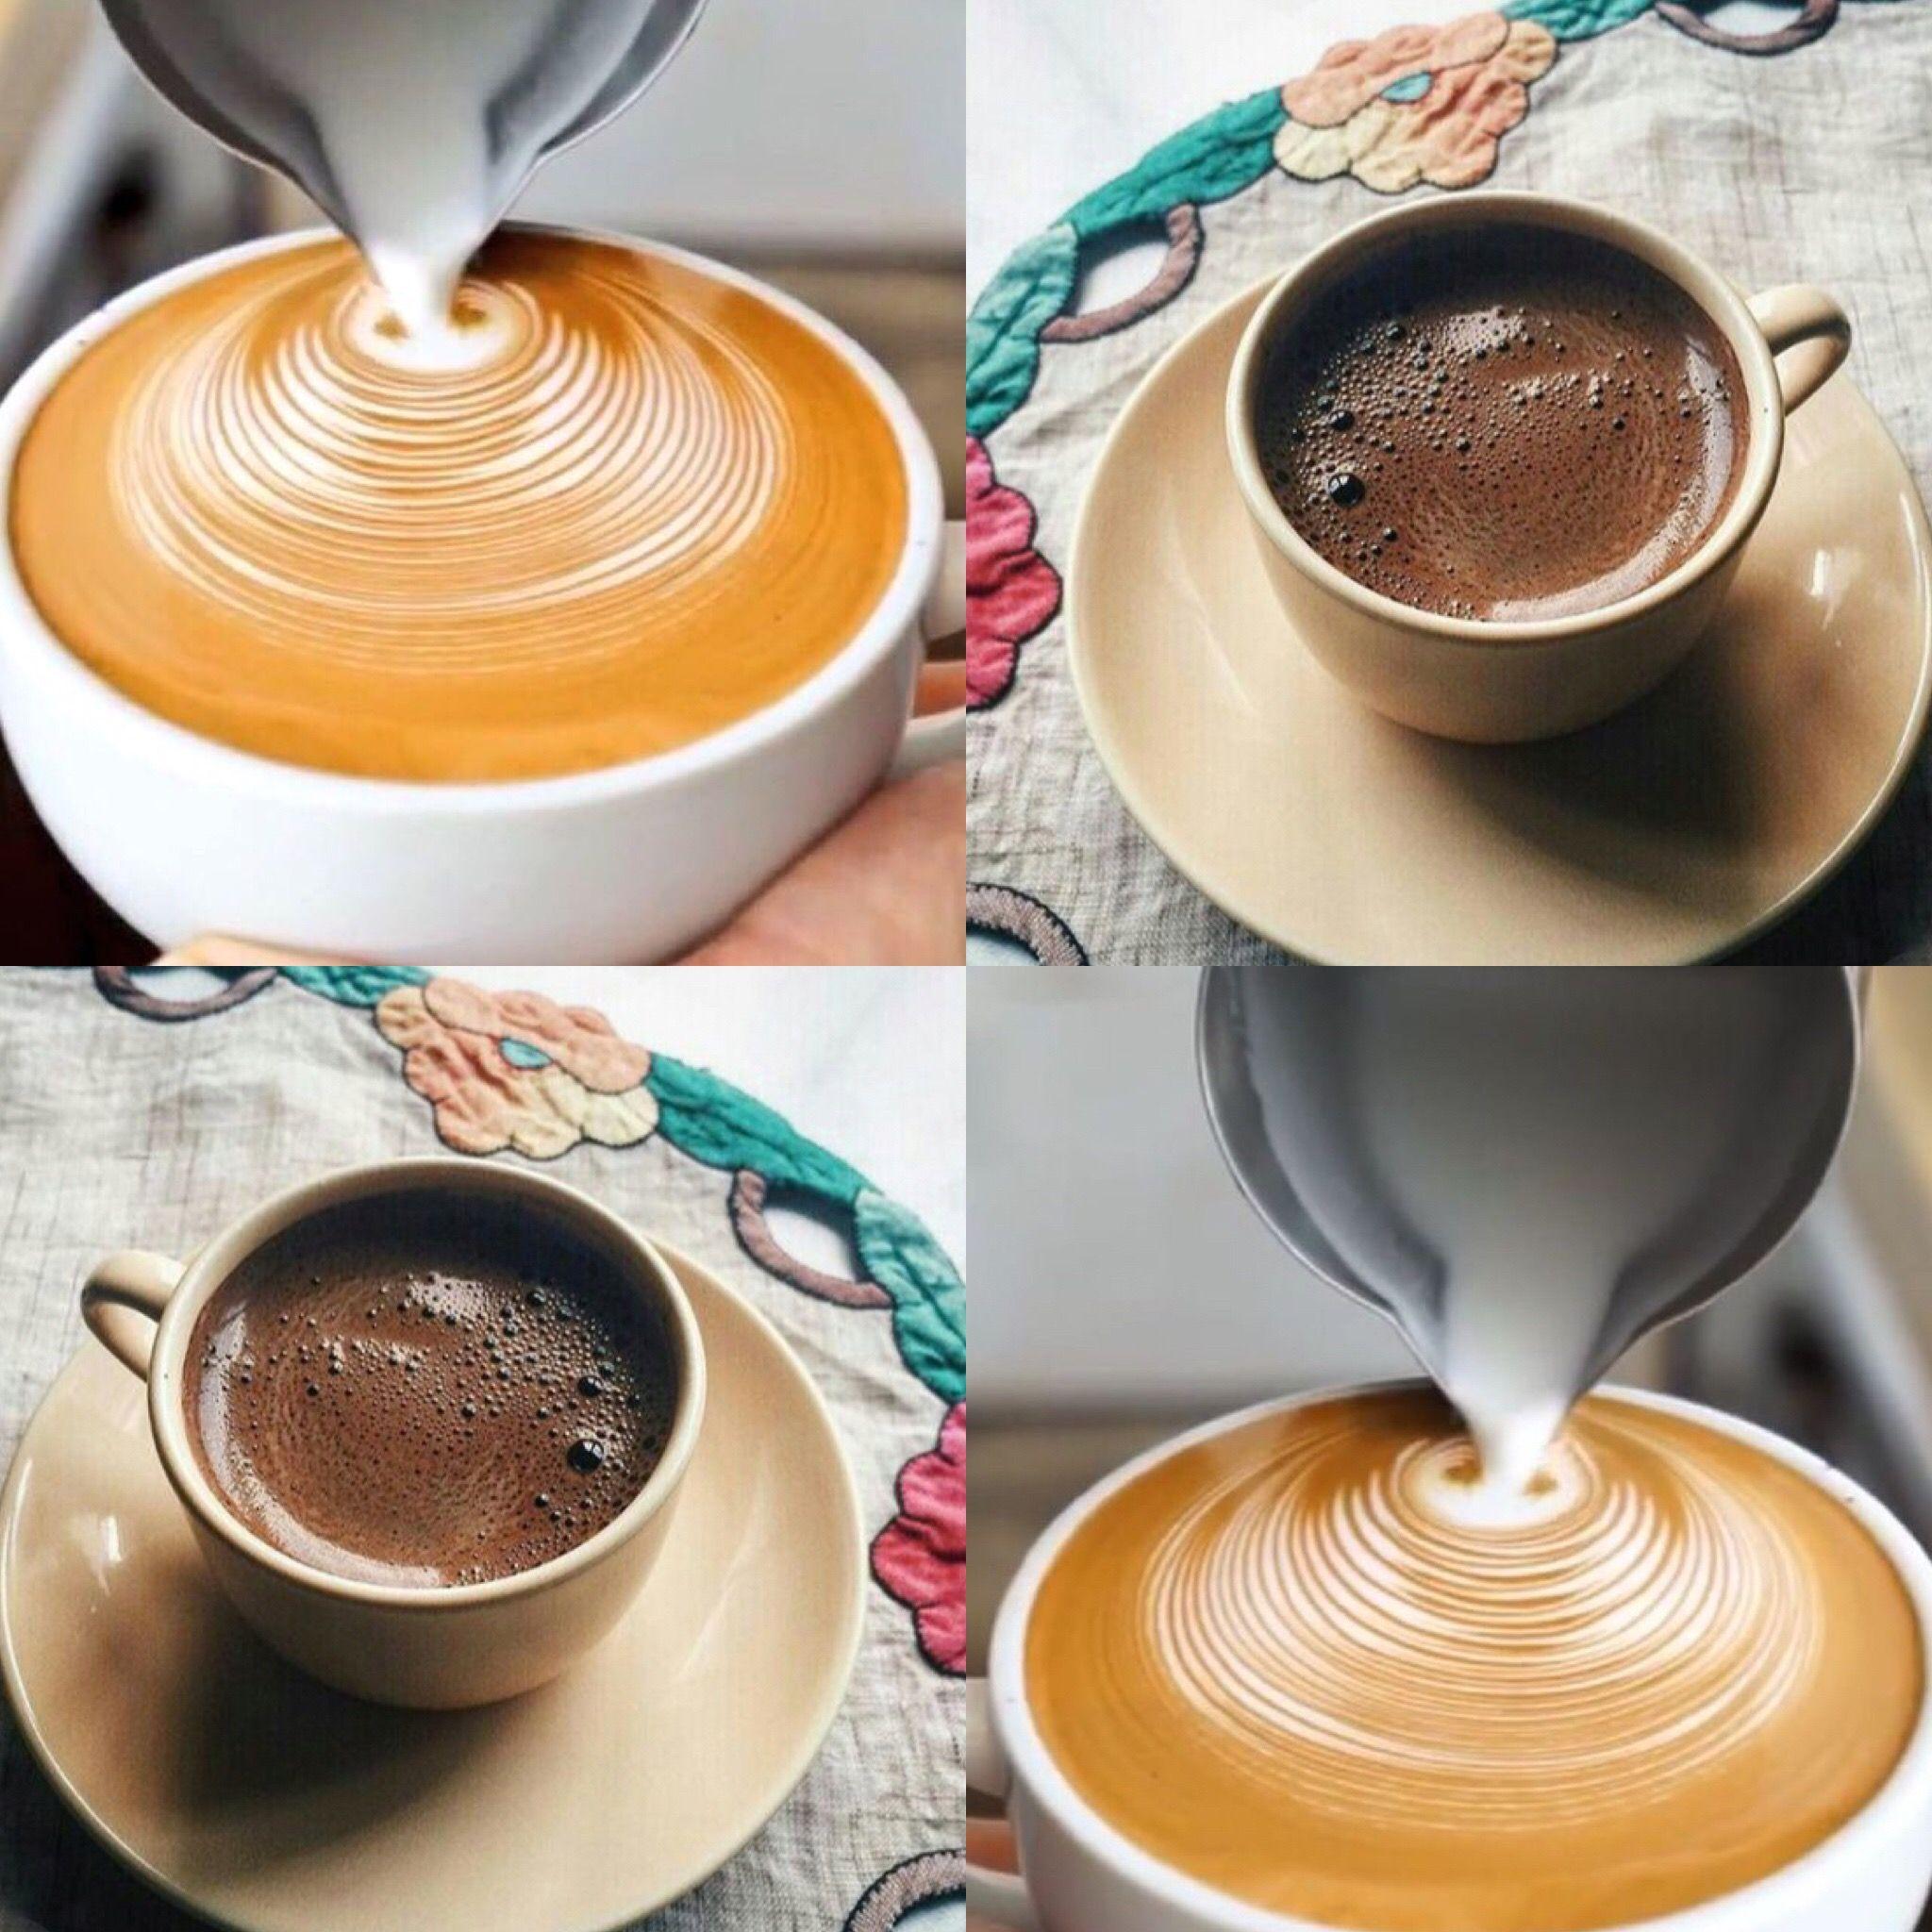 Pin By لغة القهوة On لغة القهوة لينغو كوفي Food Tableware Latte